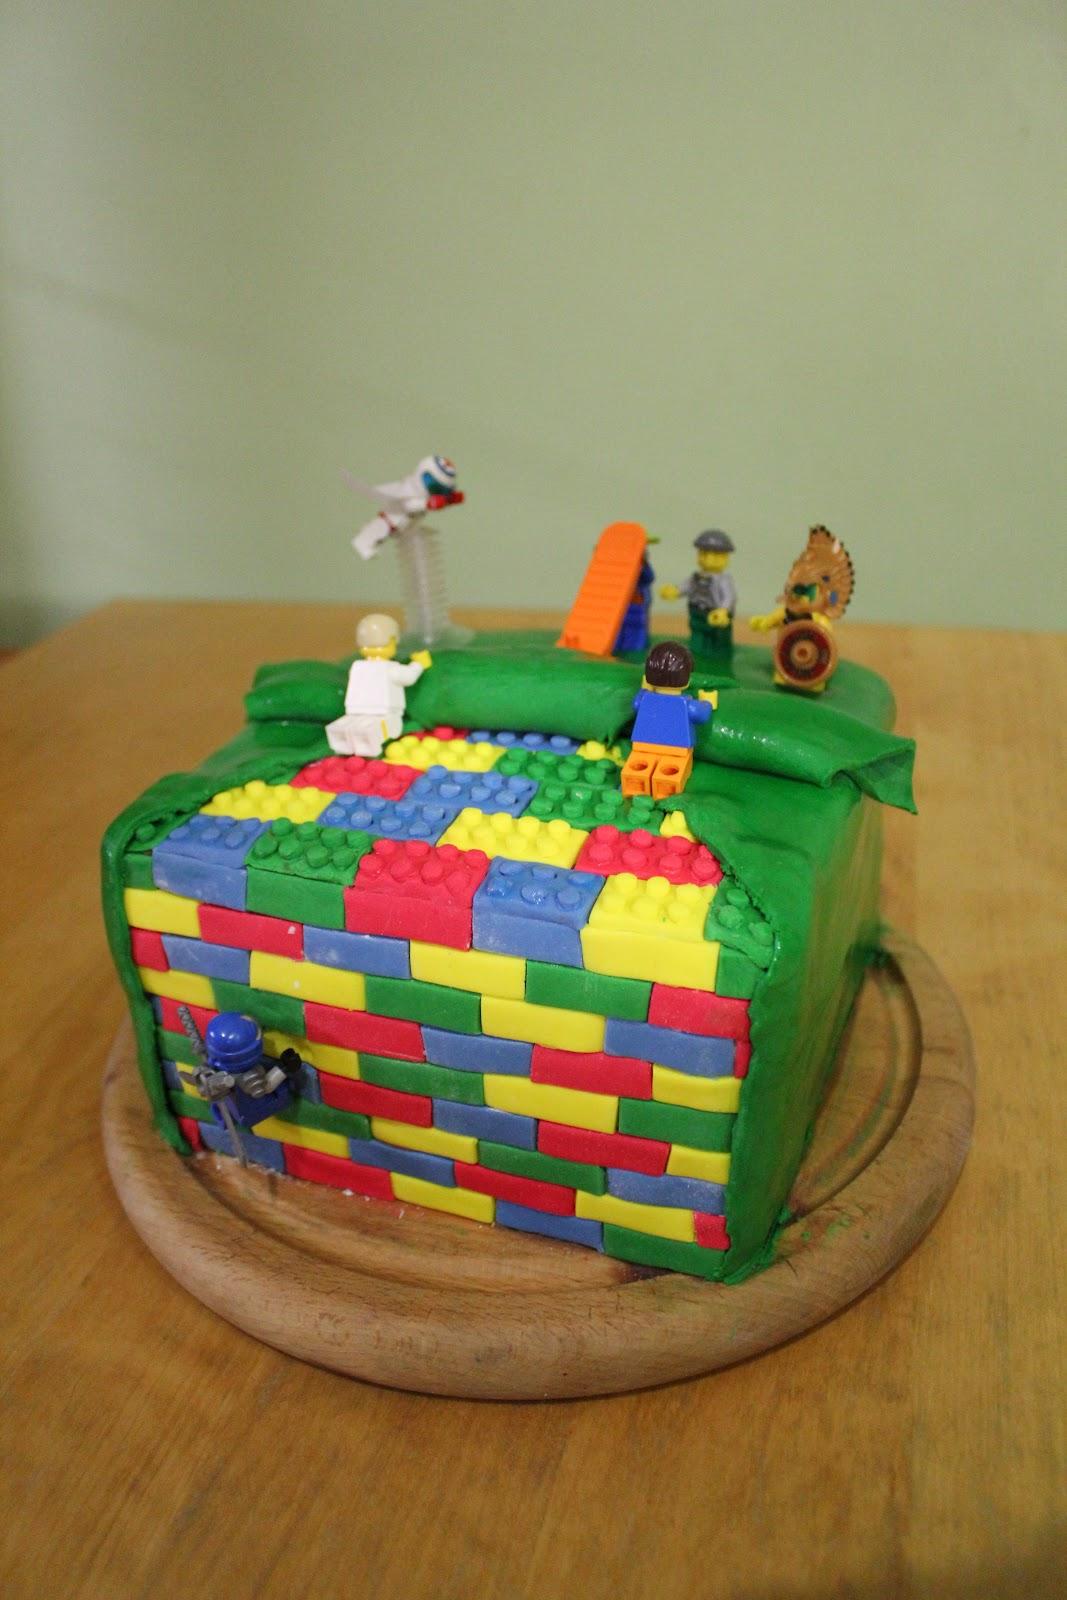 10 Year Old Birthday Cake Ideas